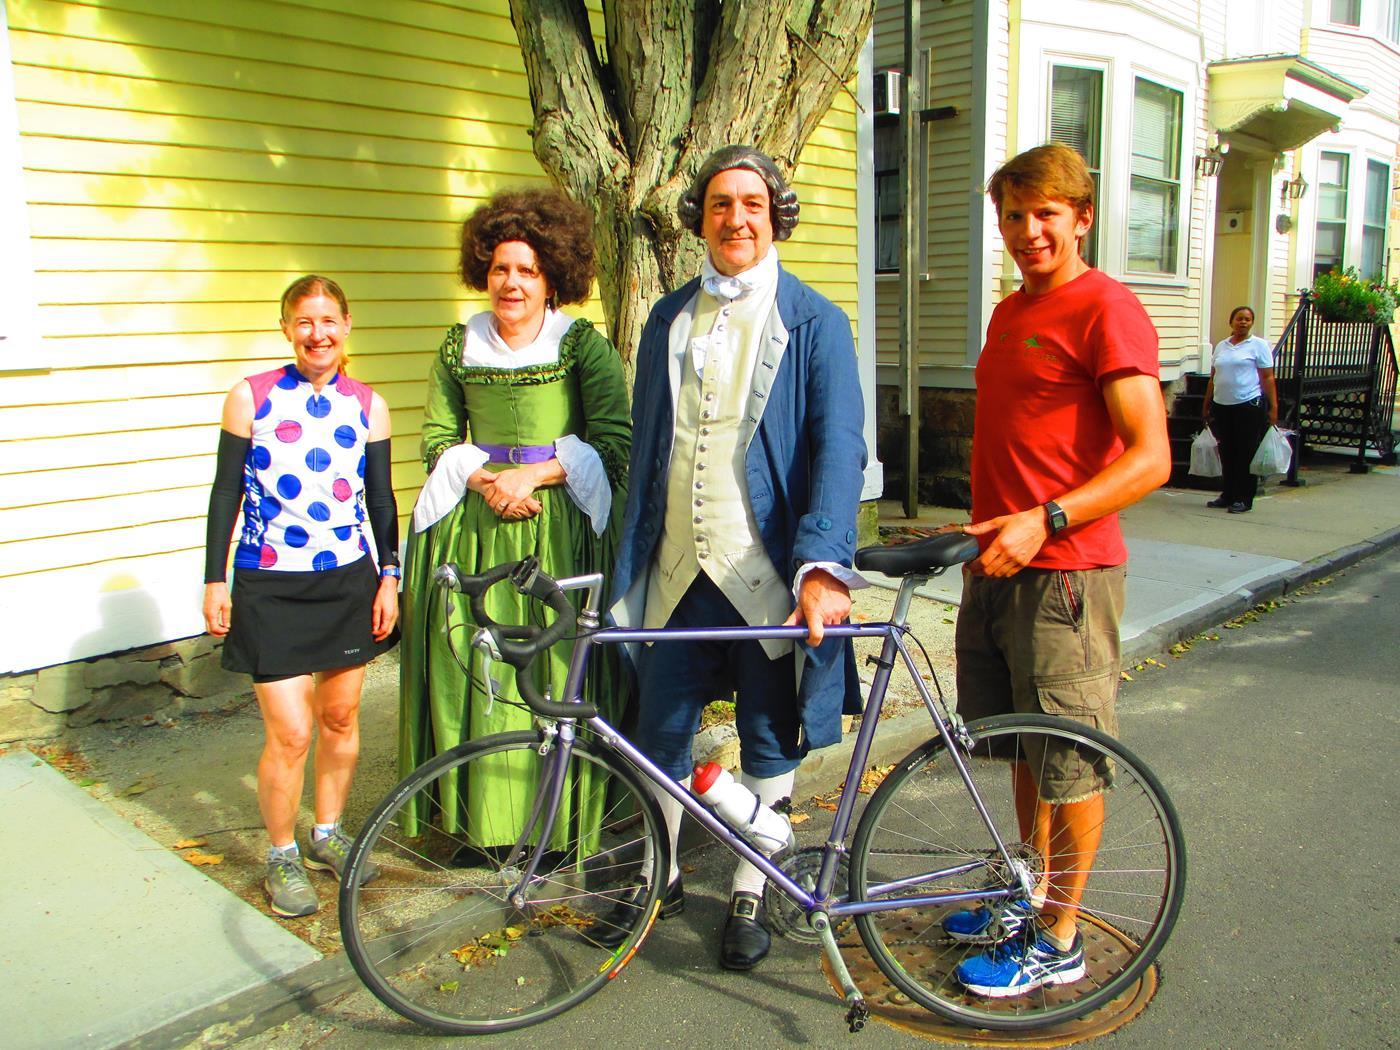 newport ri bike tour 6 great freedom adventures